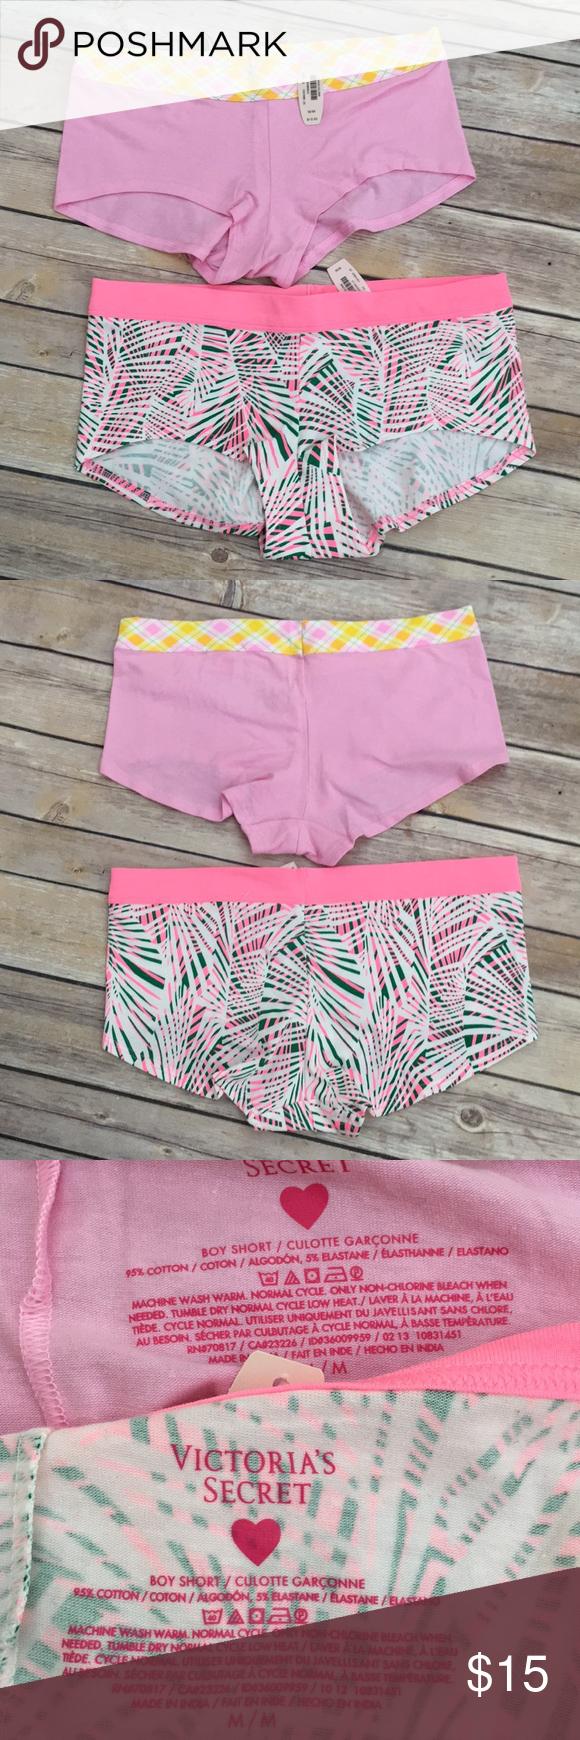 e1f0144eaede6 NWT Victoria's Secret 2pc Boyshorts Bundle Solid pink boyshorts with ...